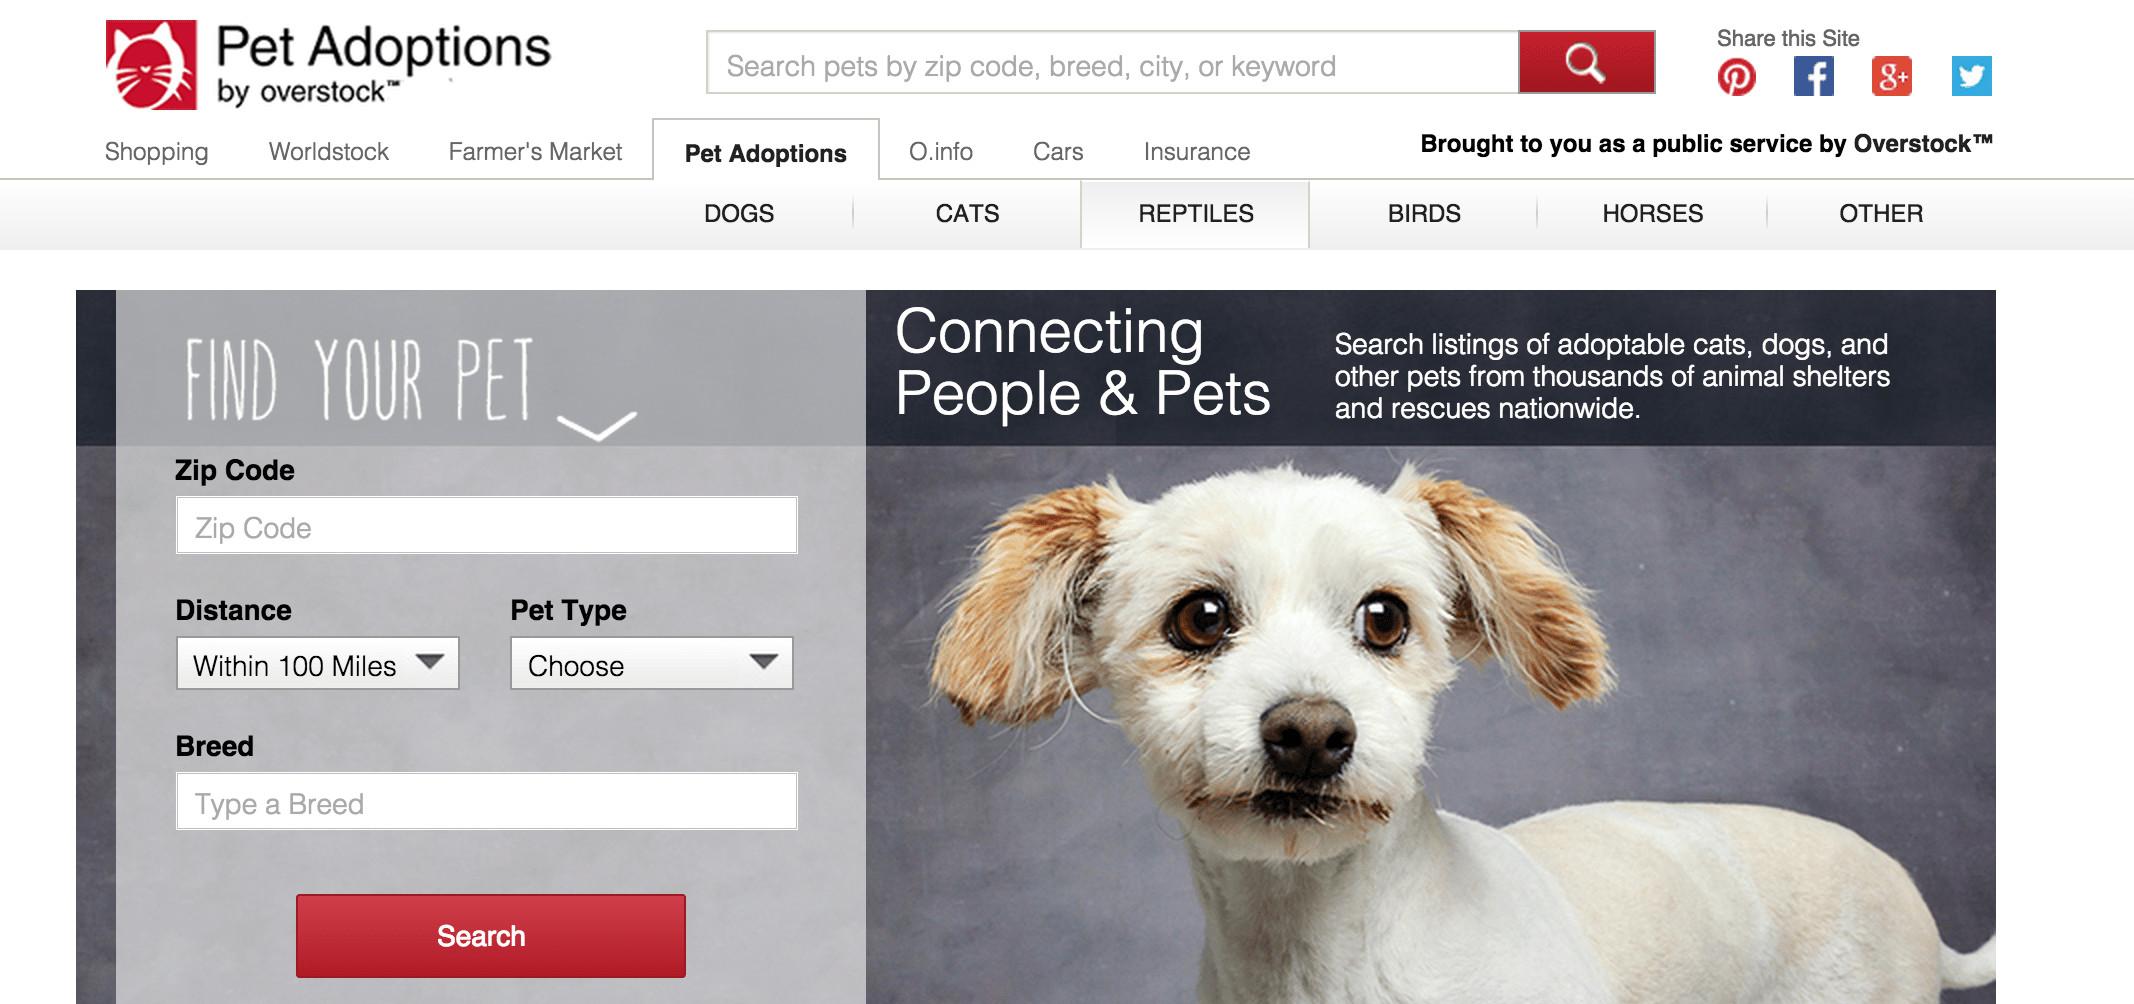 Overstock-pet-adoptions